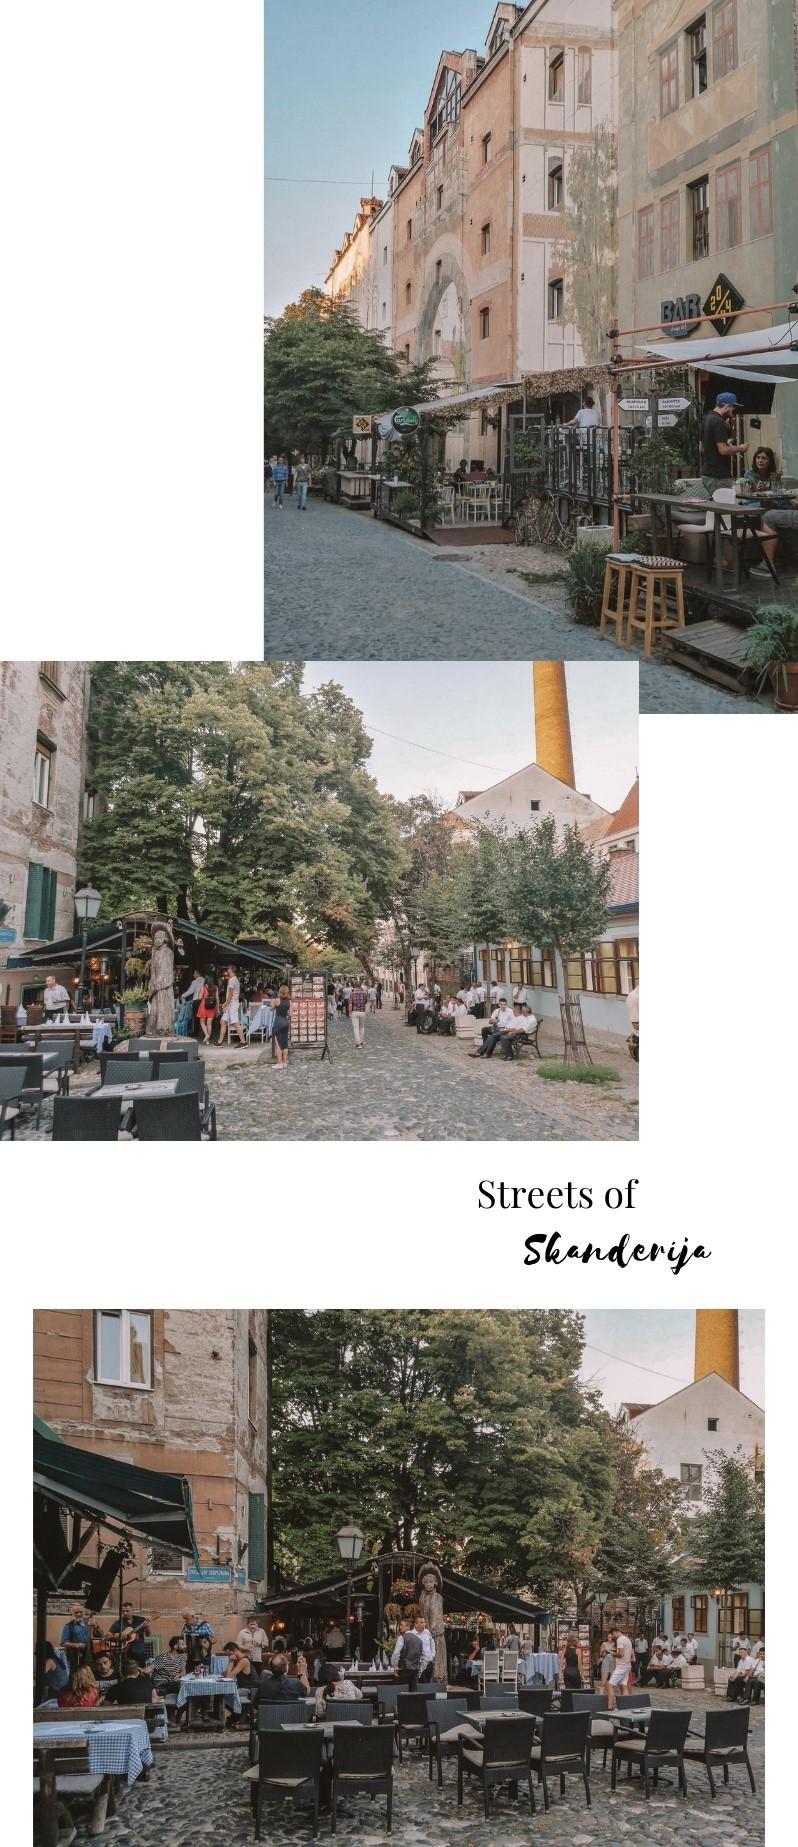 Wochenendtrip-Belgrad-Skandarlija